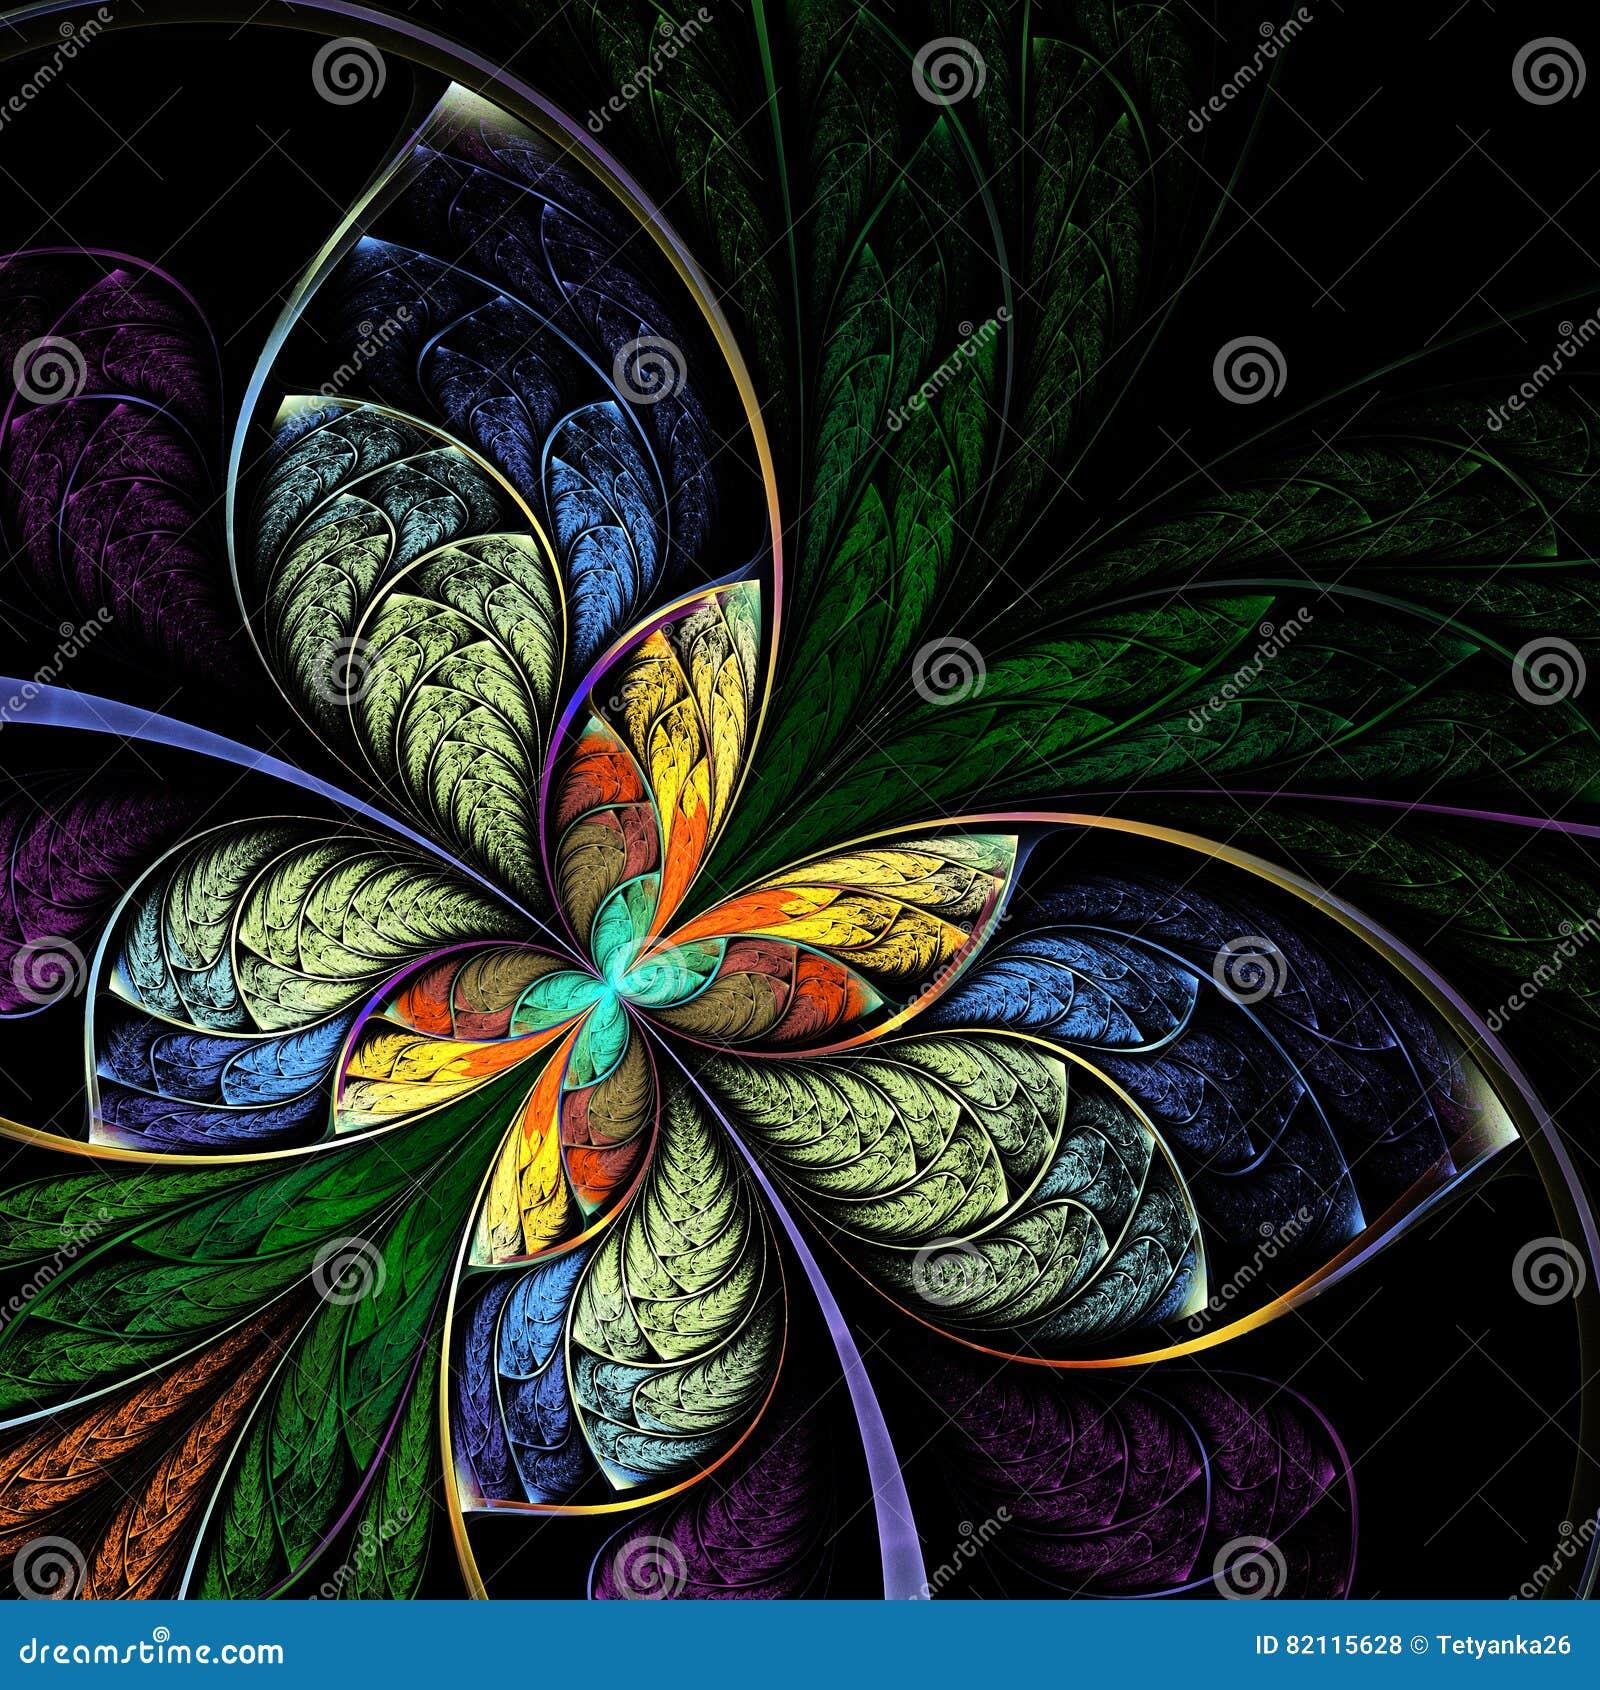 Fractal Black Flower Free Stock Photo: Fantasy Fractal Butterfly, Flower, Floral Pattern Stock